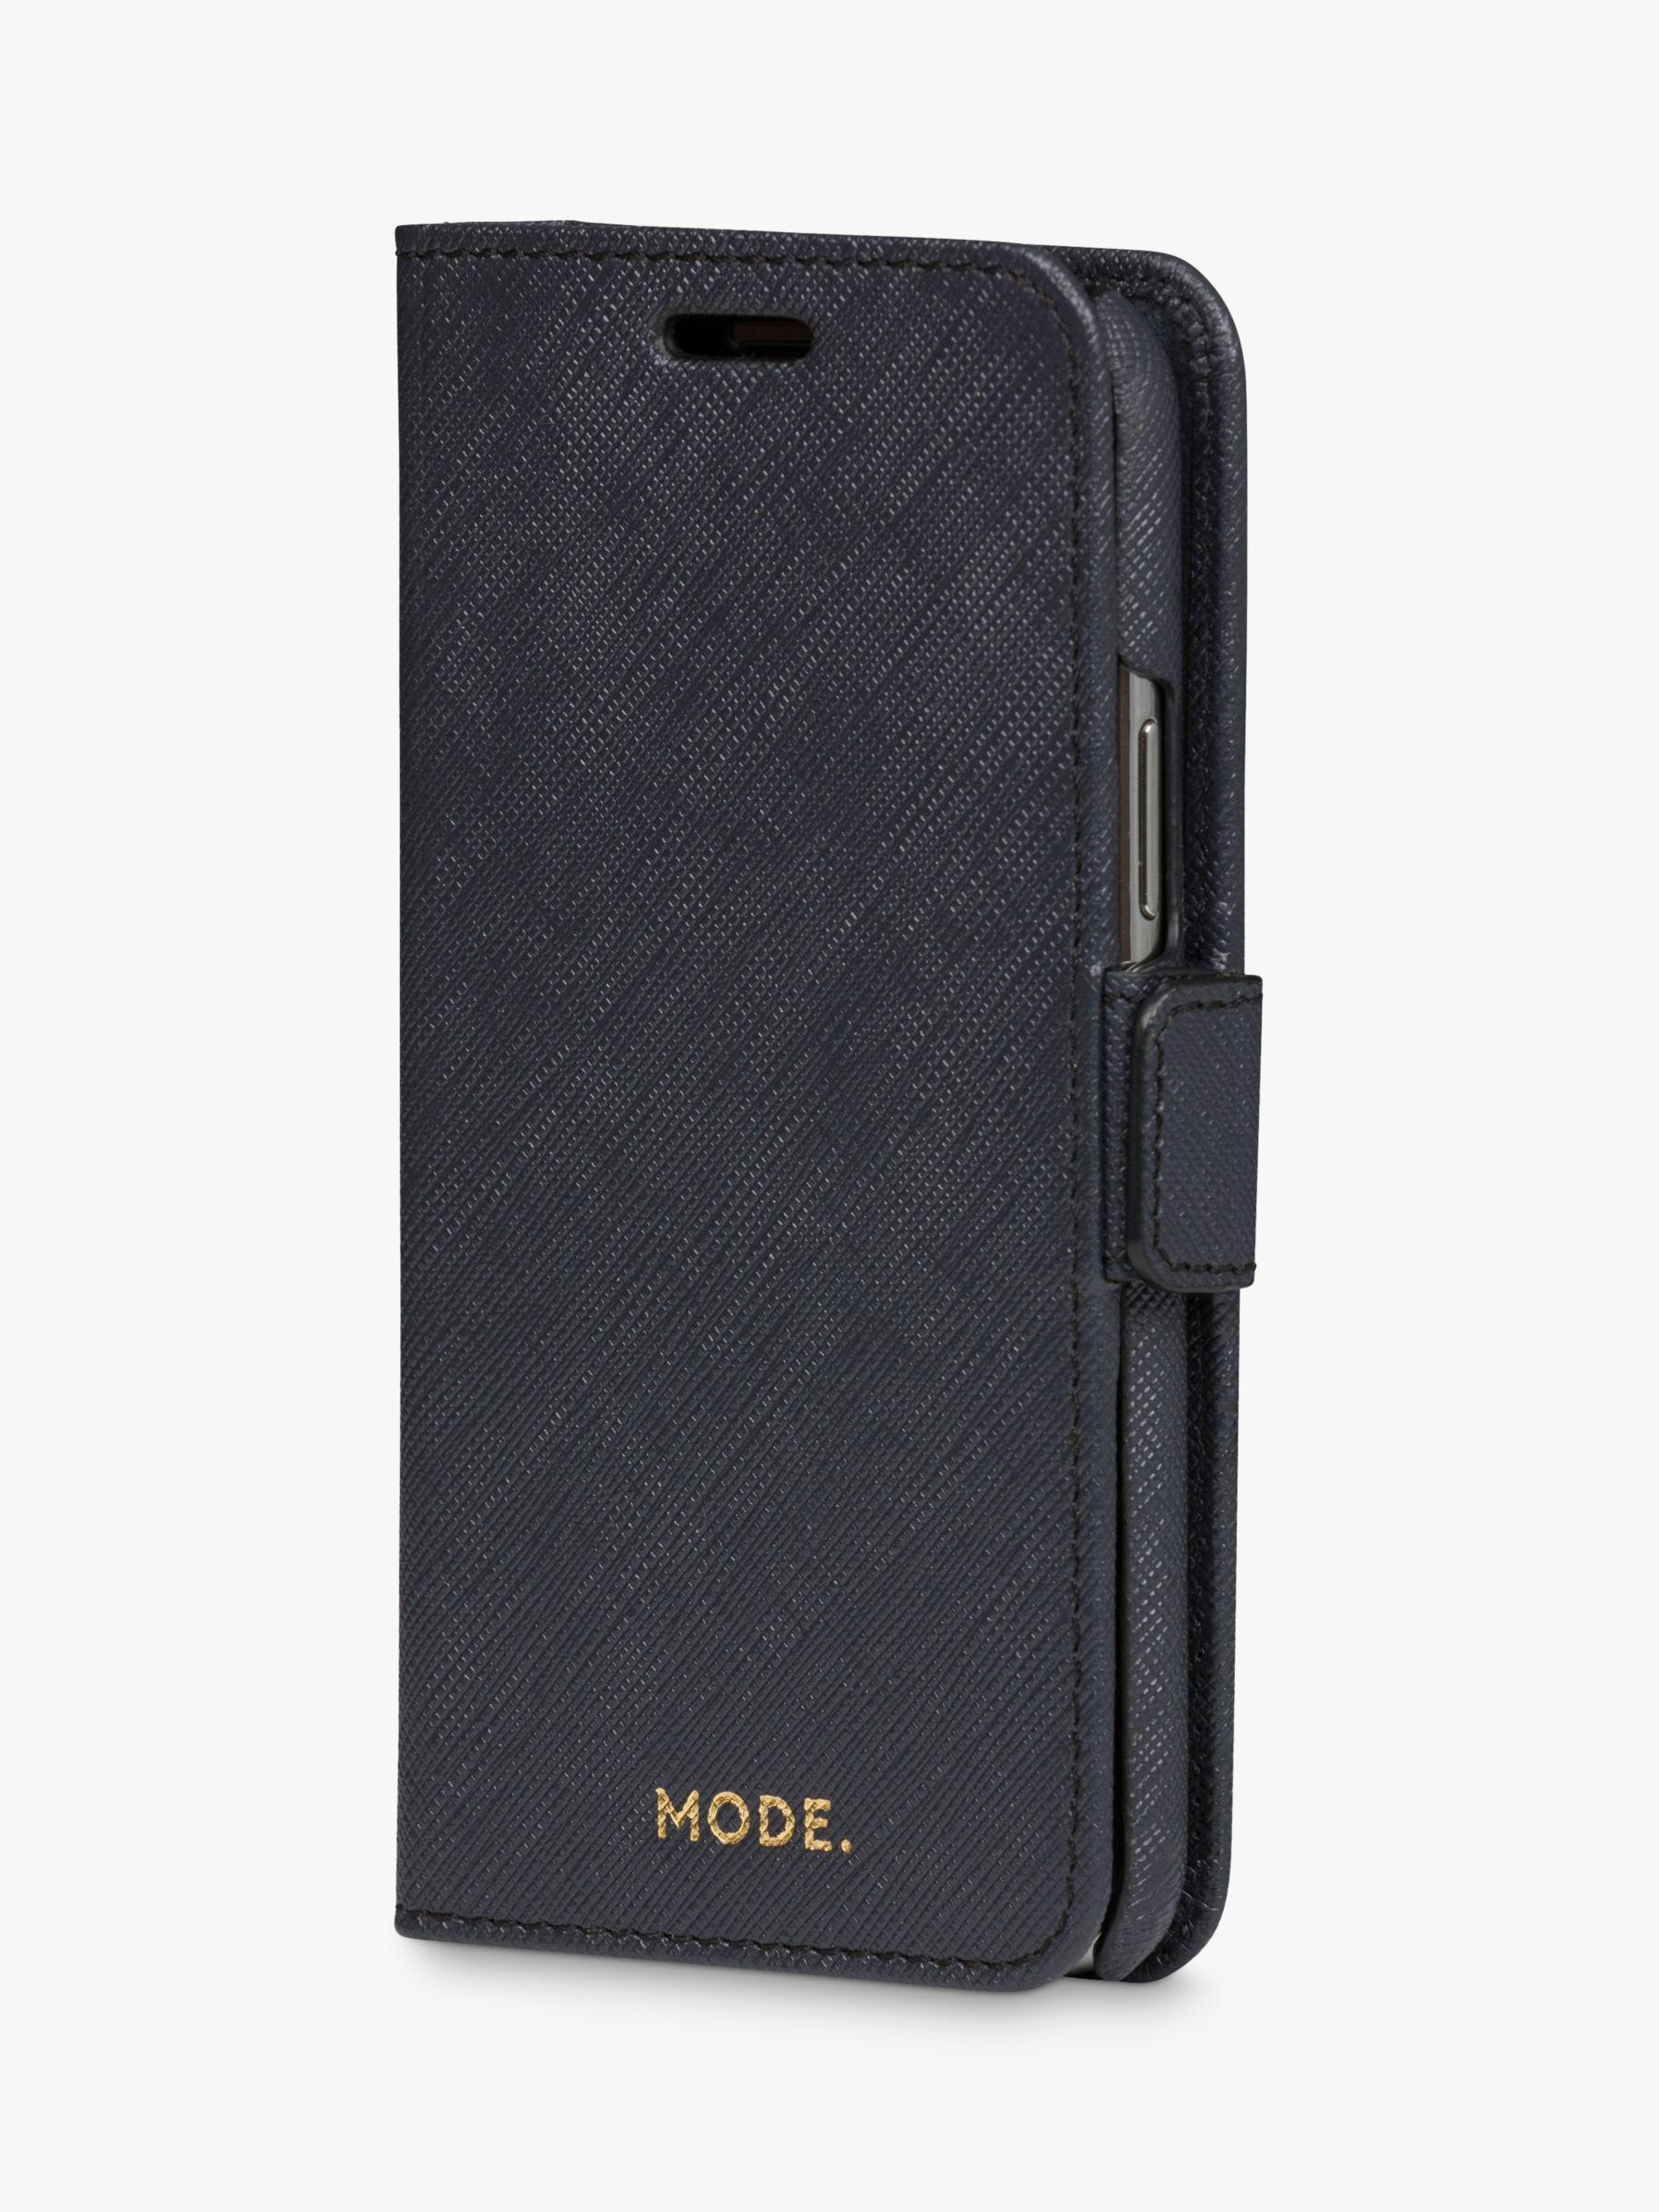 dbramante1928 MODE New York Leather dbramante1928 Folio/Cradle Case for iPhone 11 Pro, Night Black